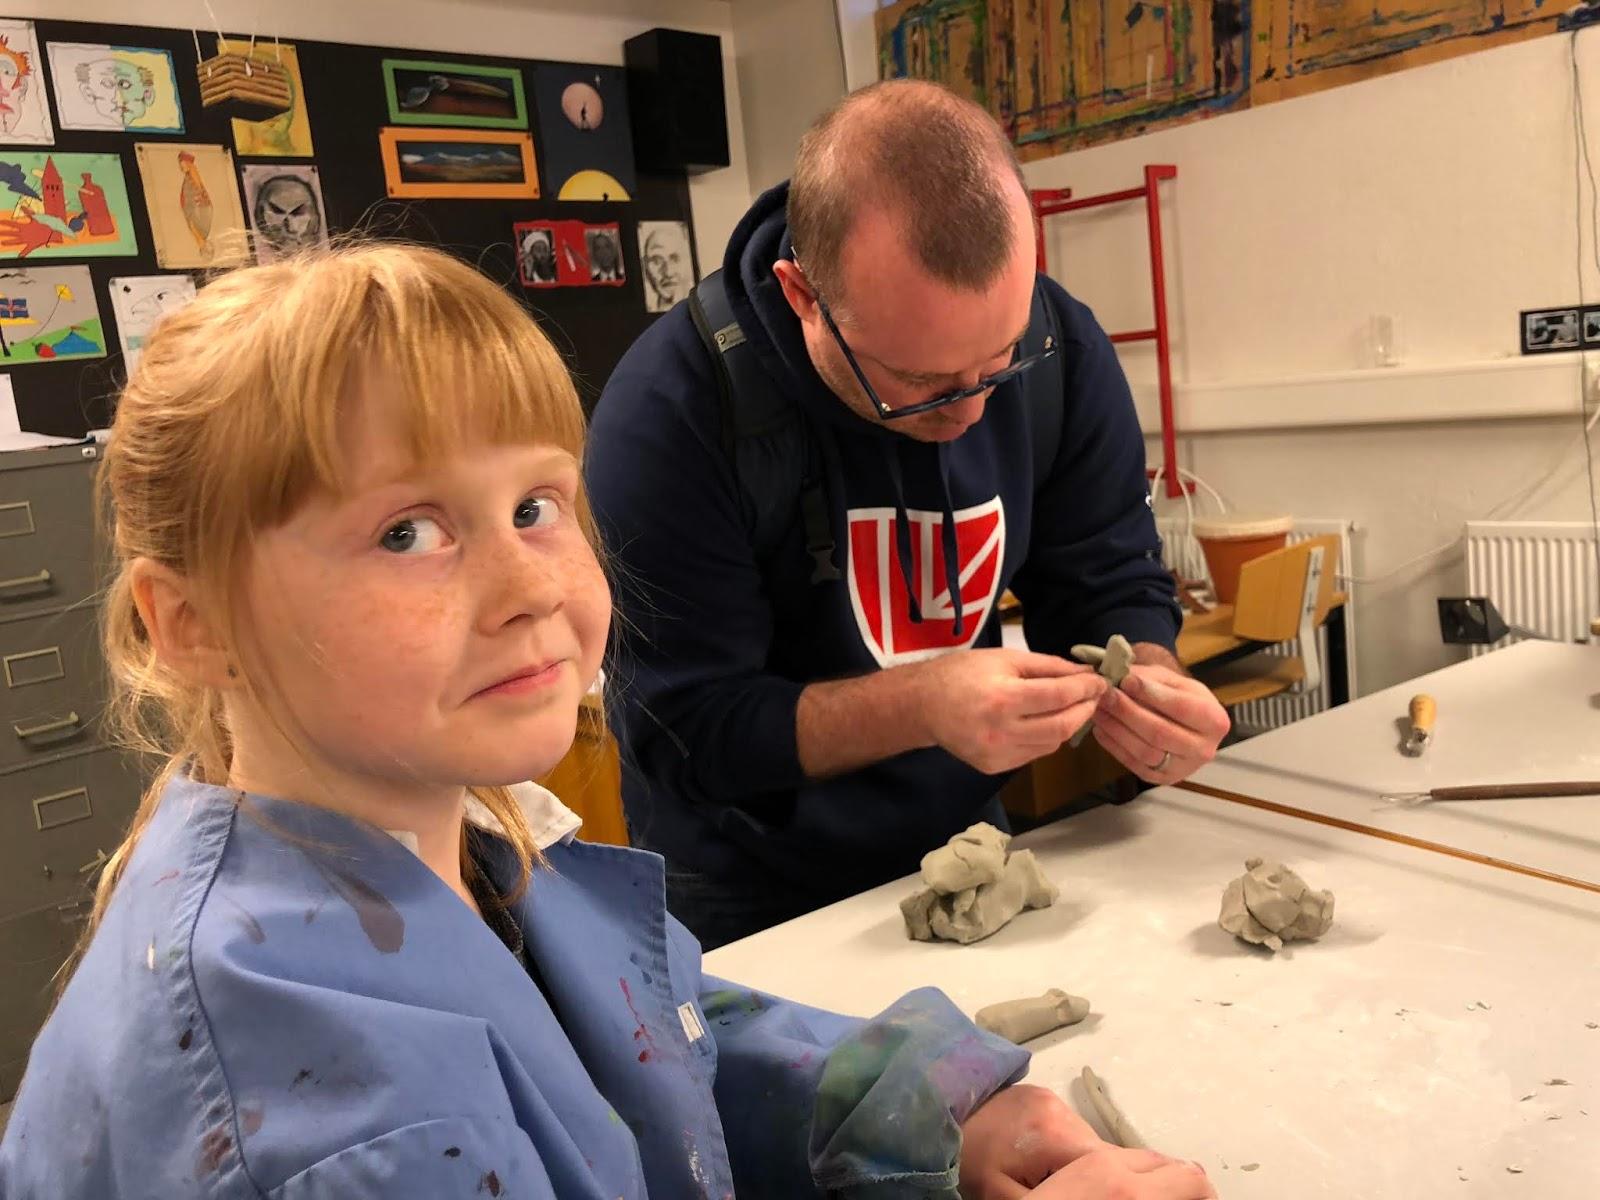 Adventures in Icelandic Schools #MakerEd #MakerMentality